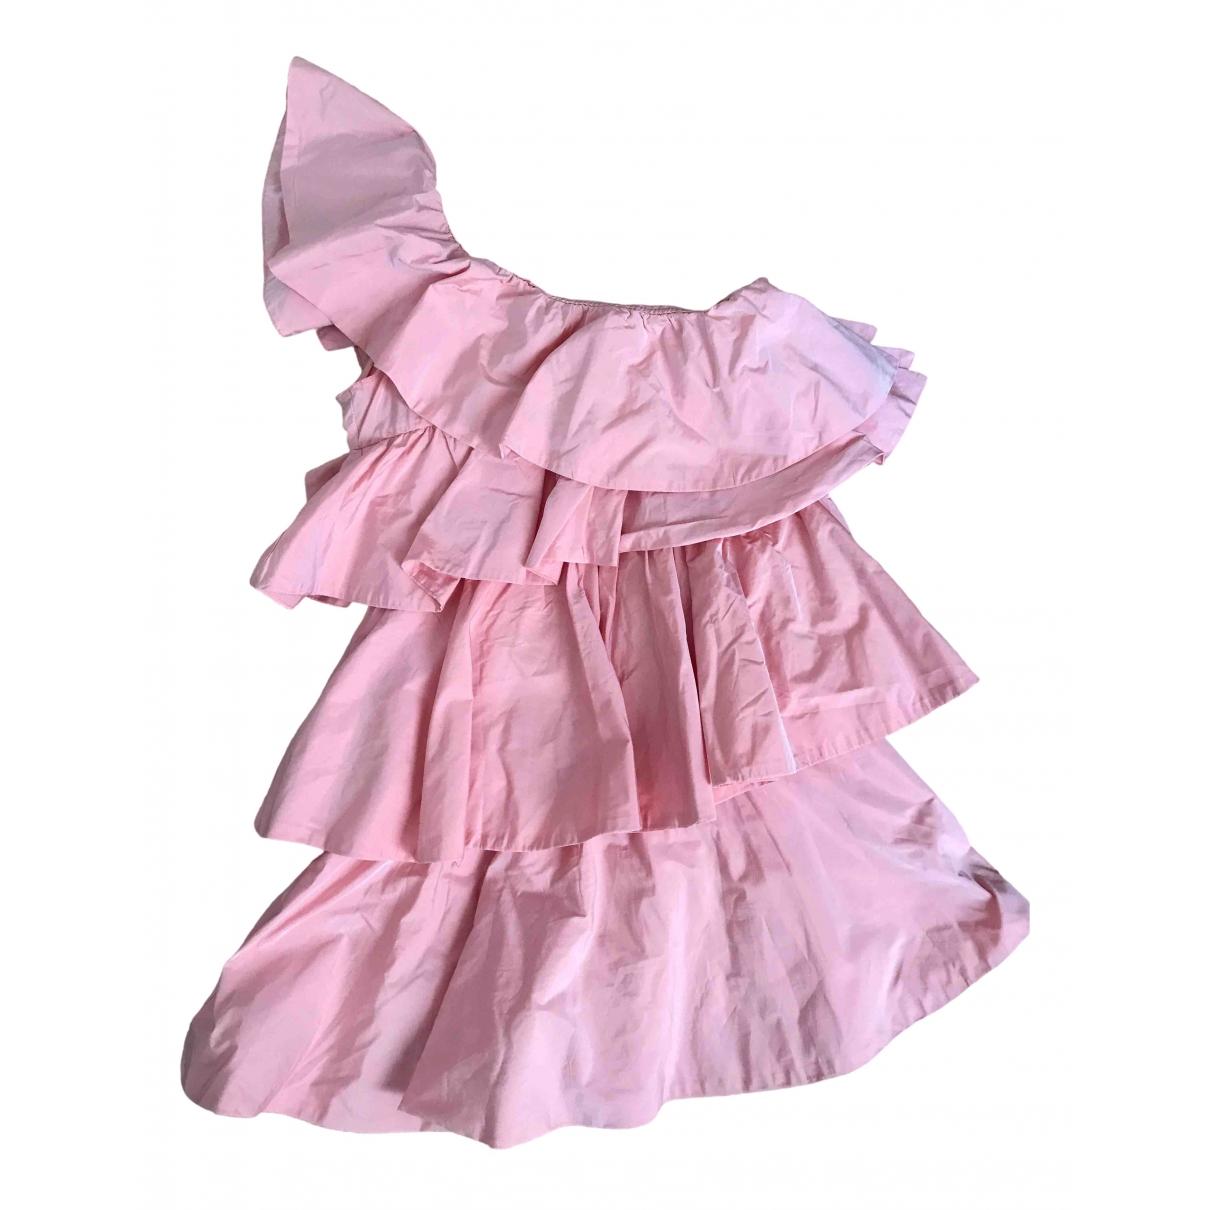 Zara \N Pink dress for Women S International